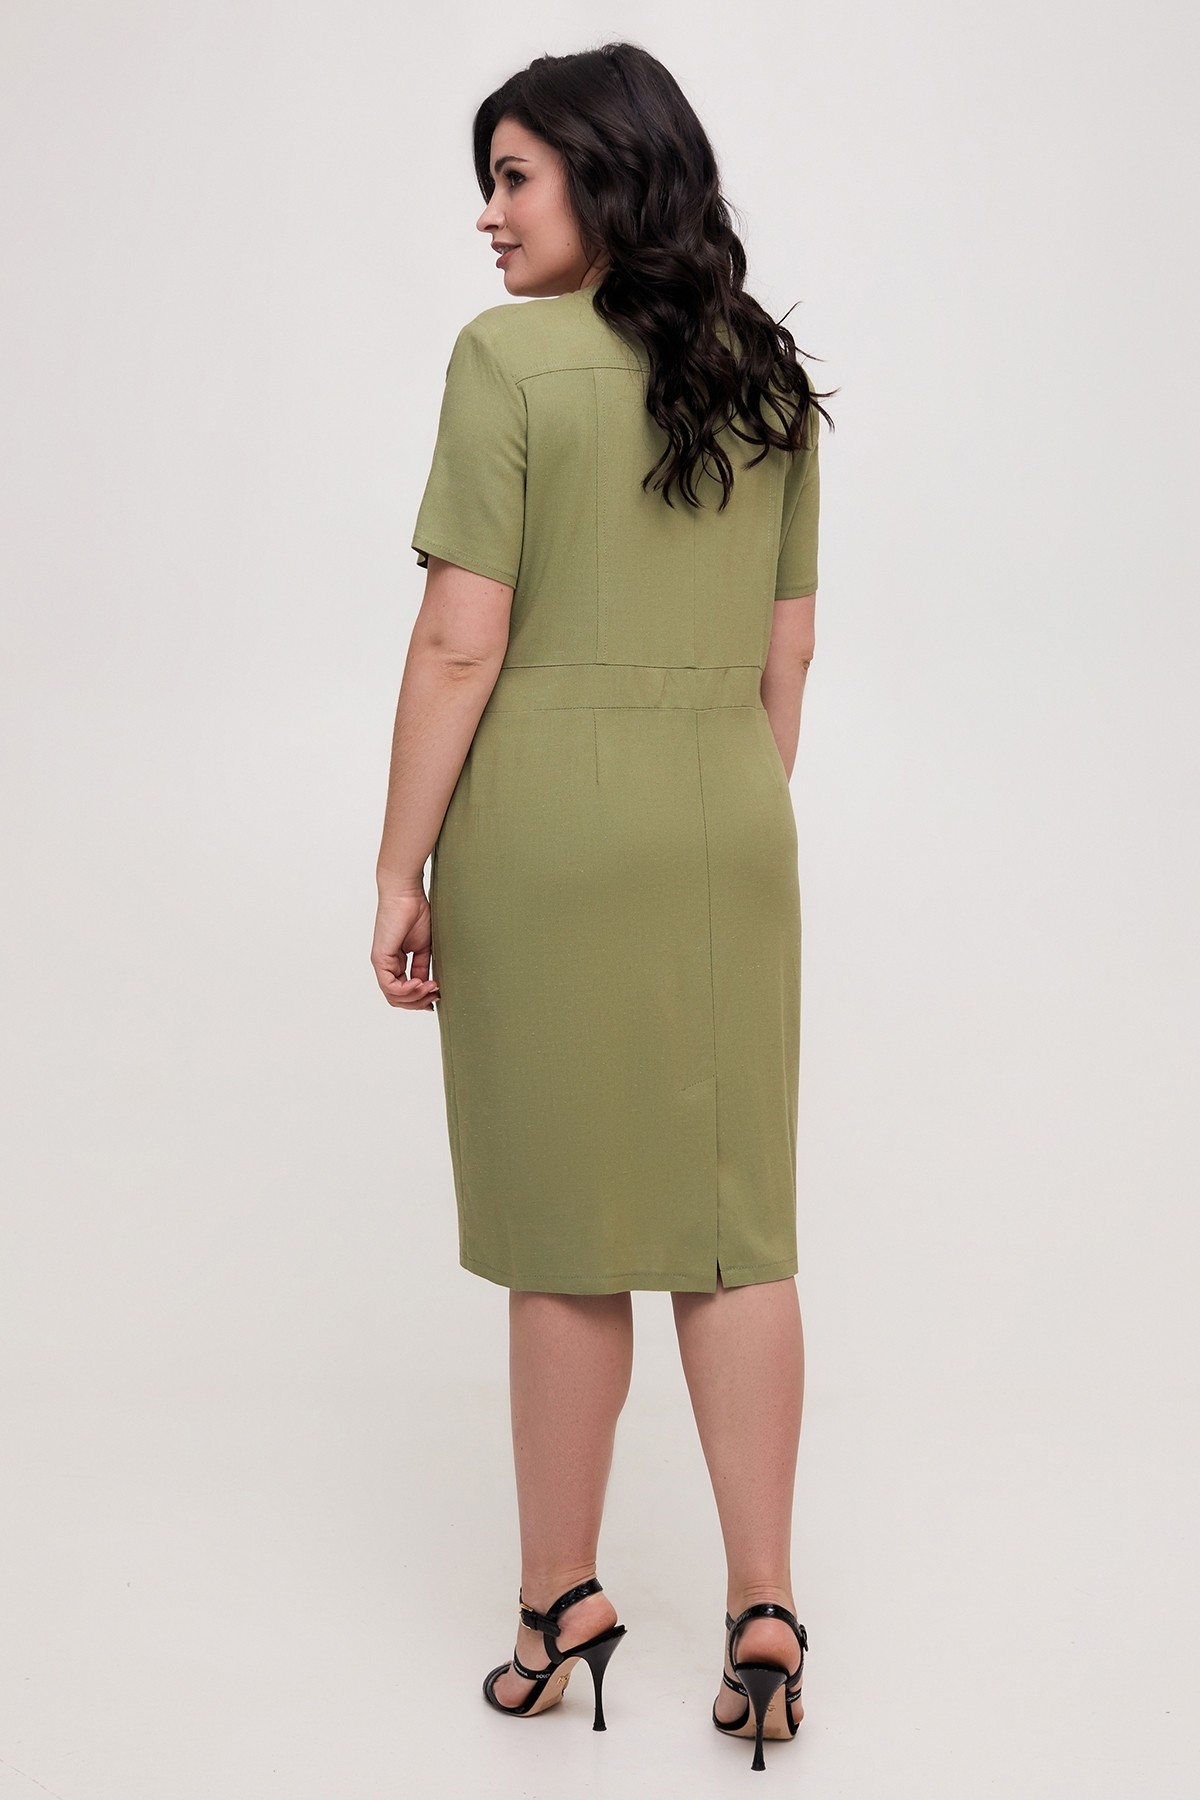 Сукня Аркадія (Аркадия) (зелений)